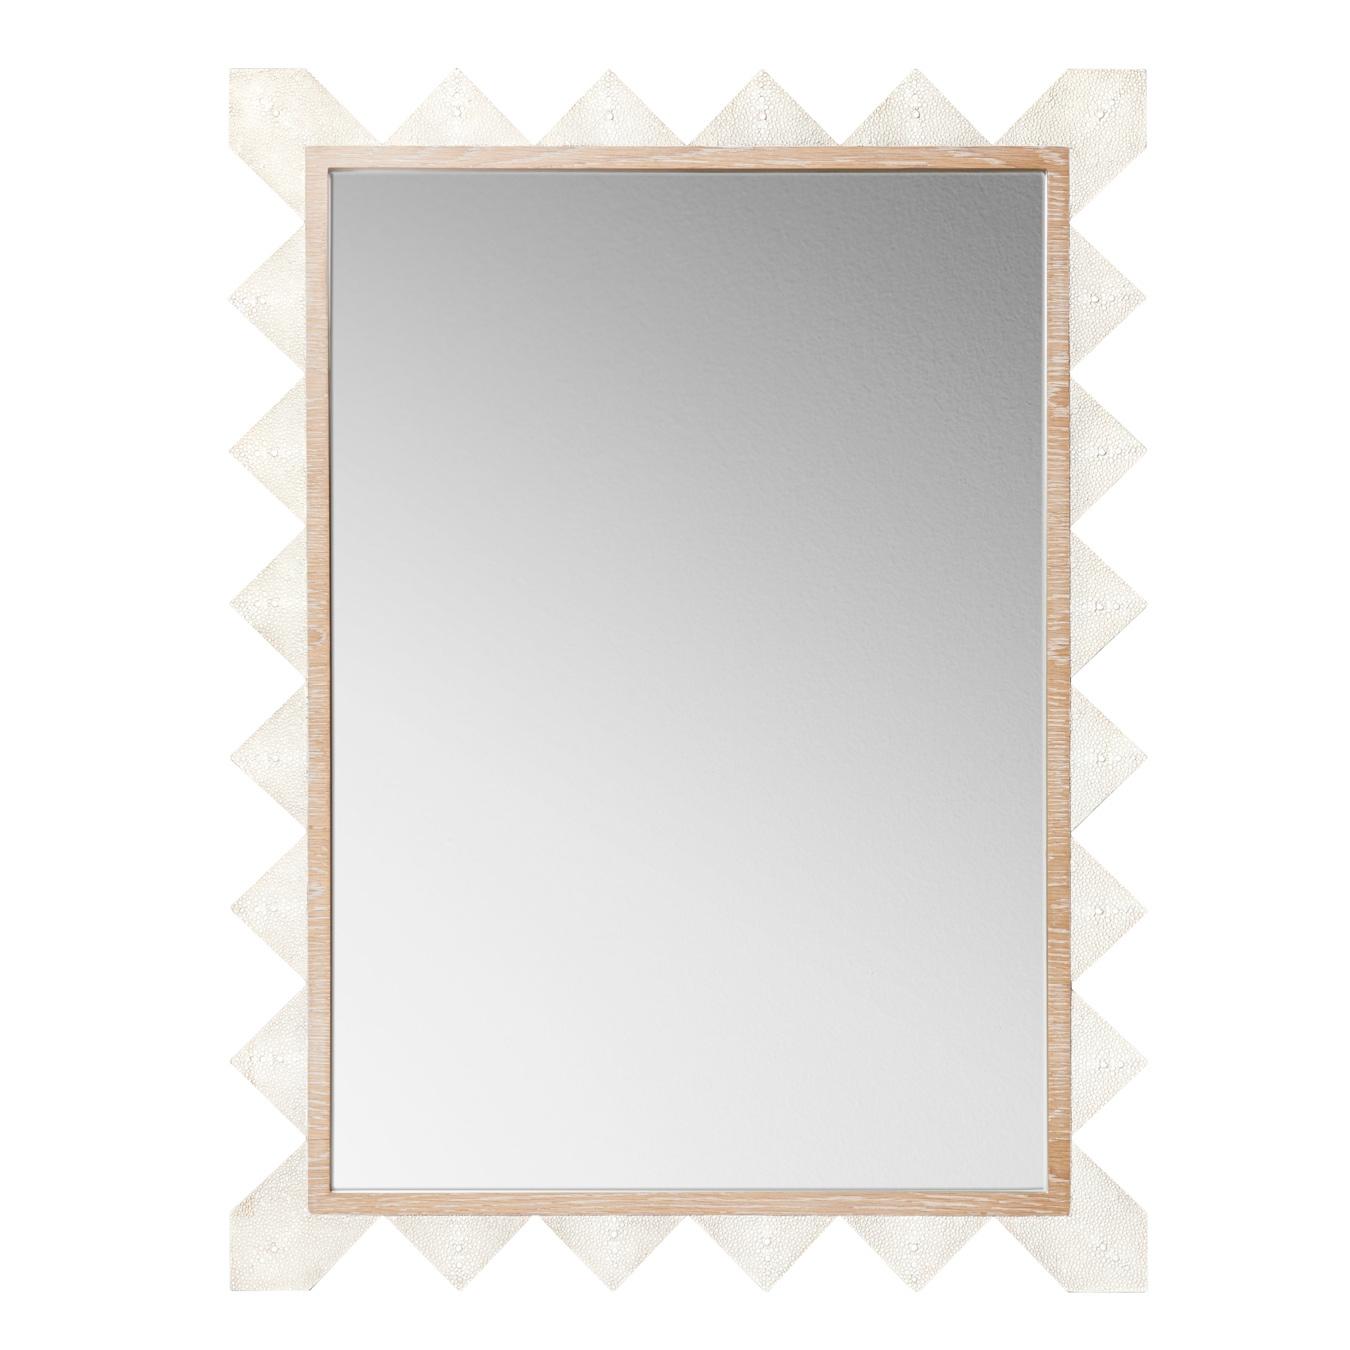 Emporium Home Chancey Cream Wall Mirror Regarding Cream Wall Mirror (Image 8 of 15)